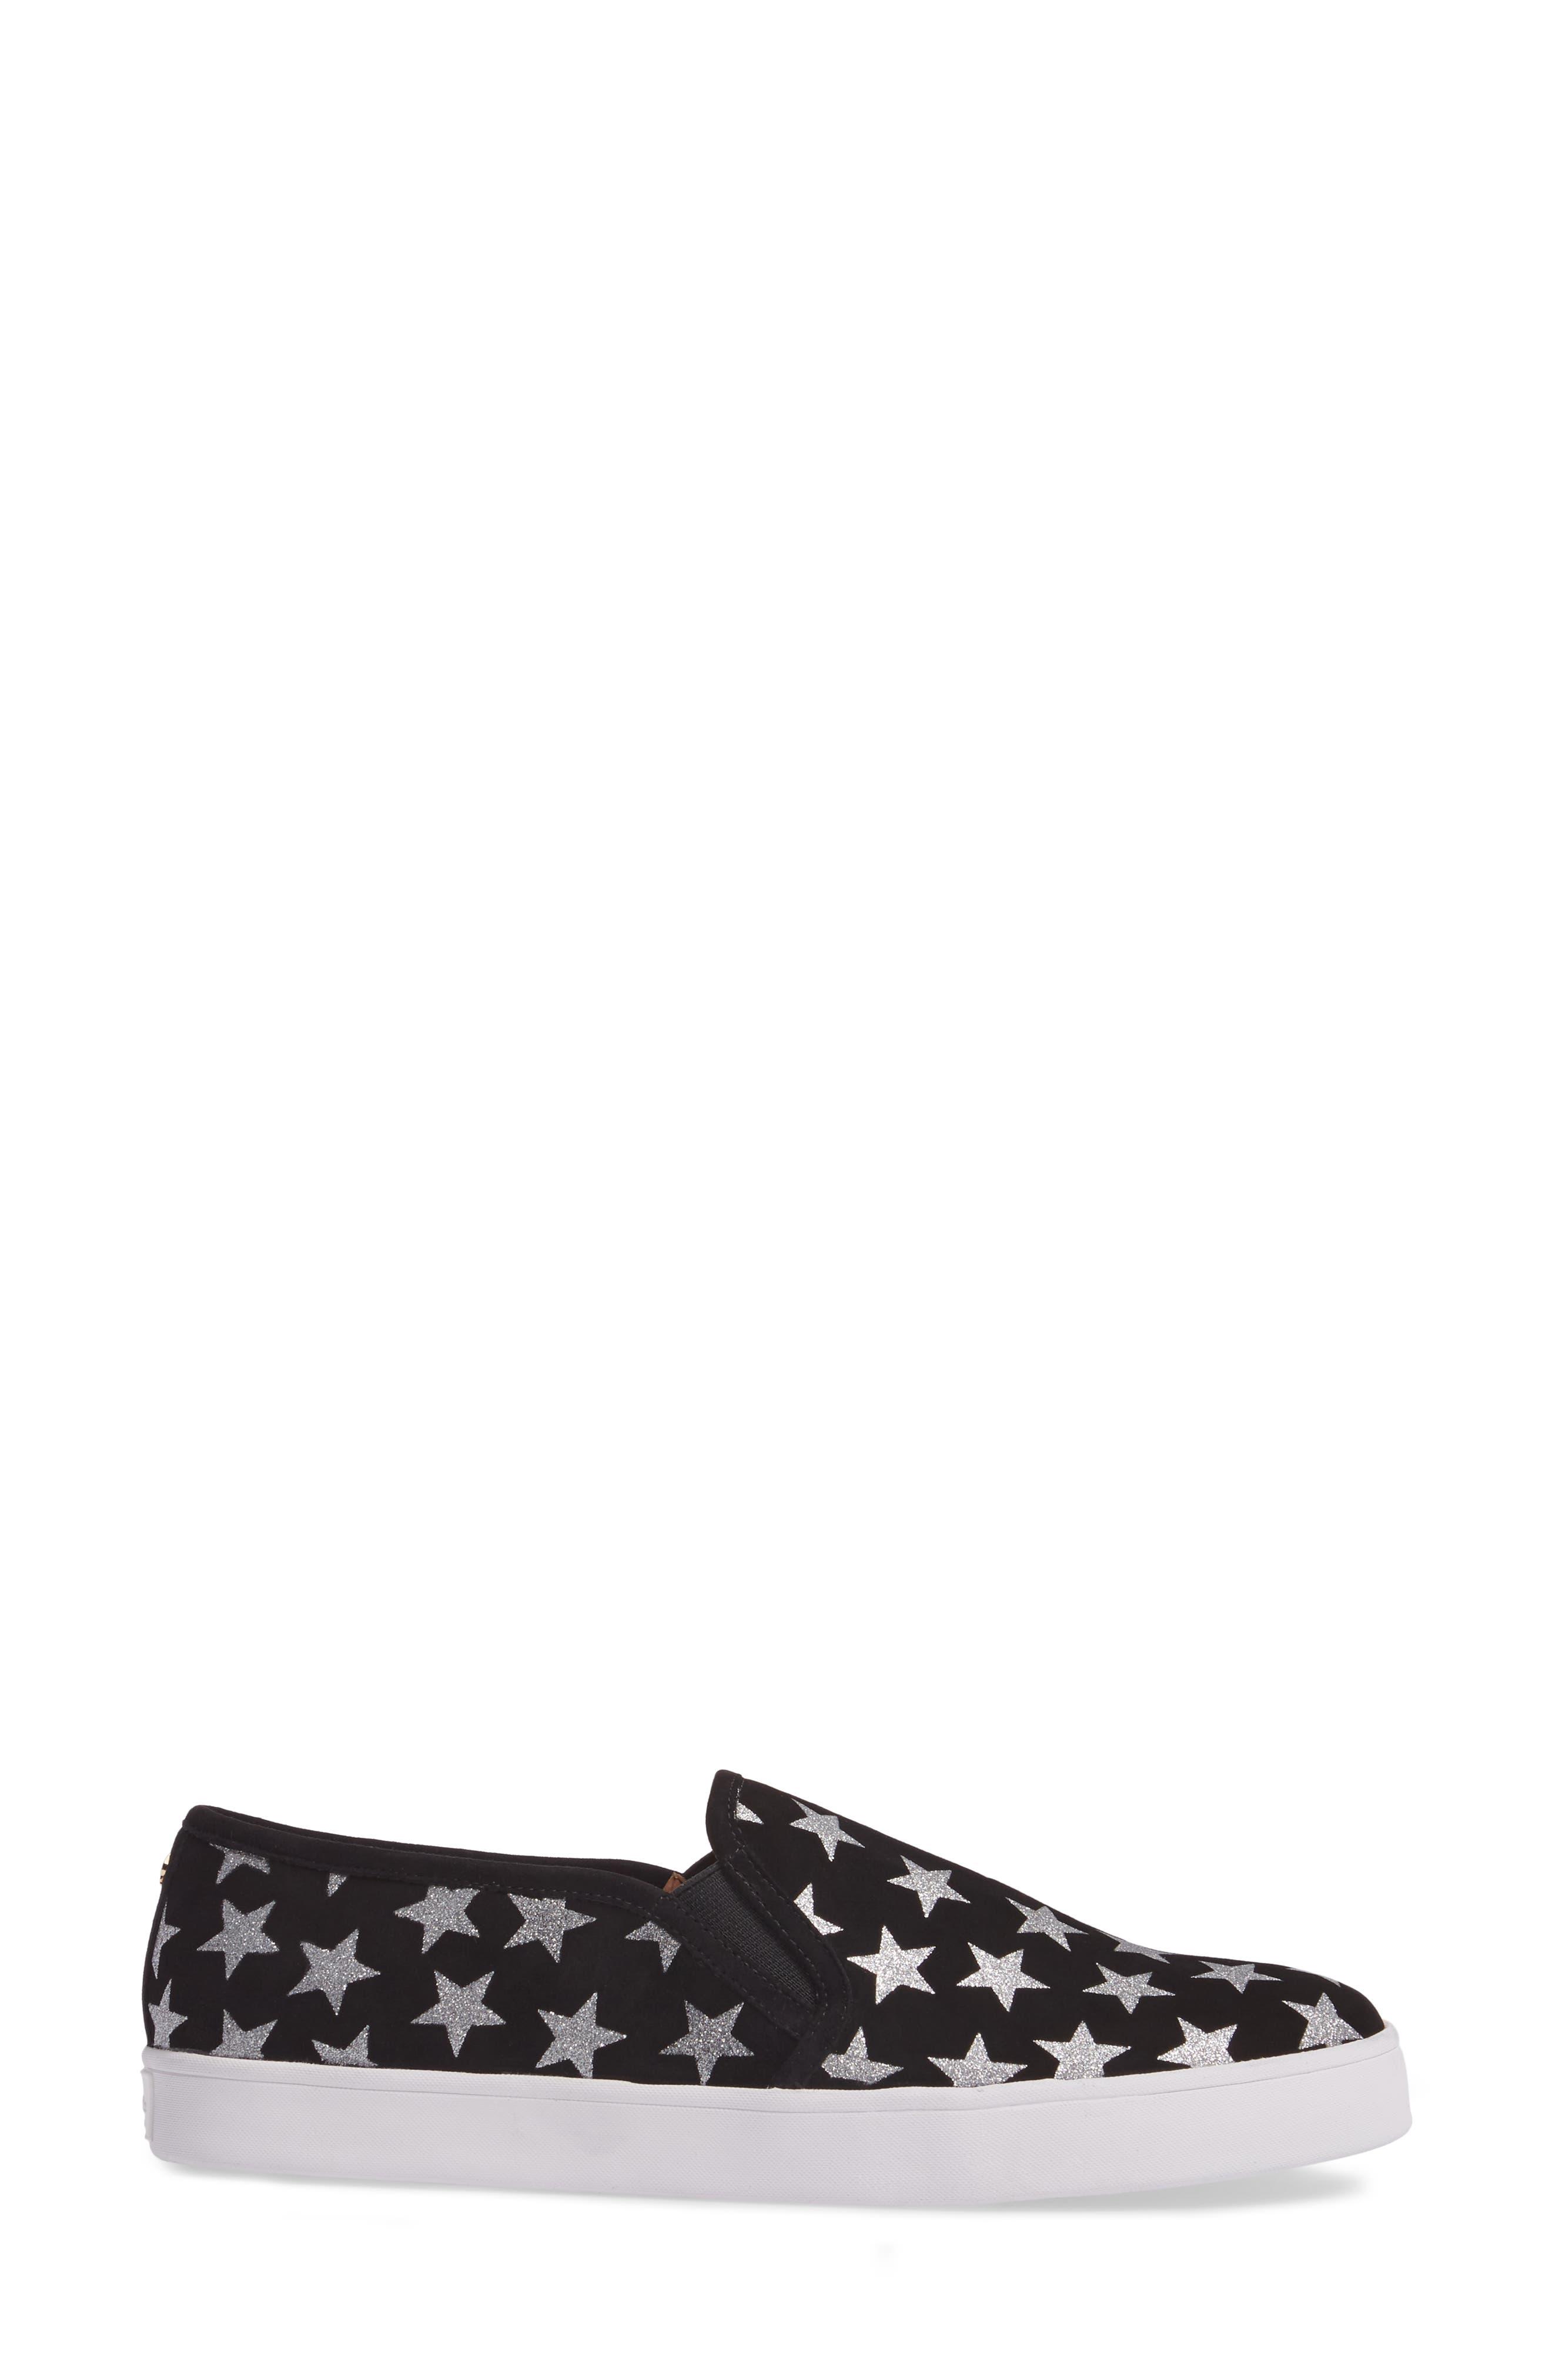 liberty slip-on sneaker,                             Alternate thumbnail 3, color,                             Black/ Silver